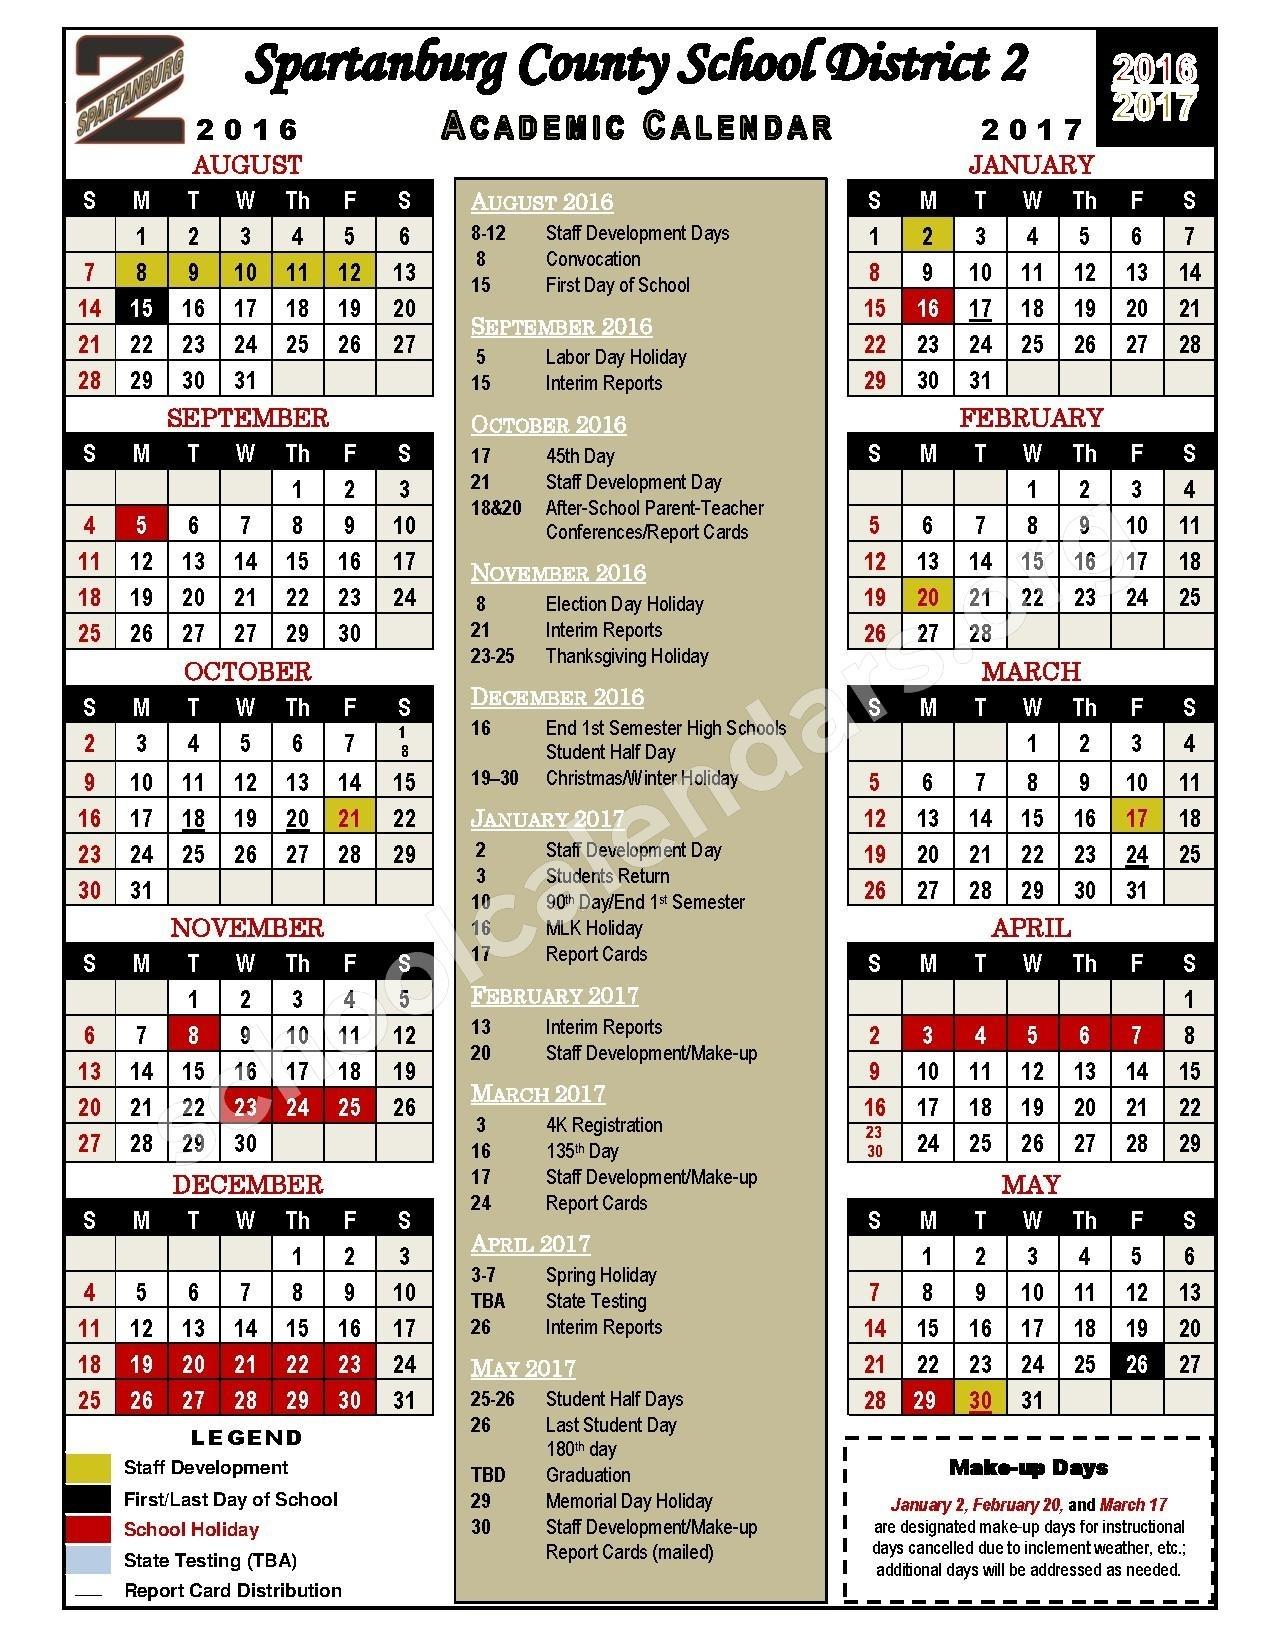 2016 - 2017 Academic Calendar | Spartanburg School District 2 Incredible School Calendar District 2